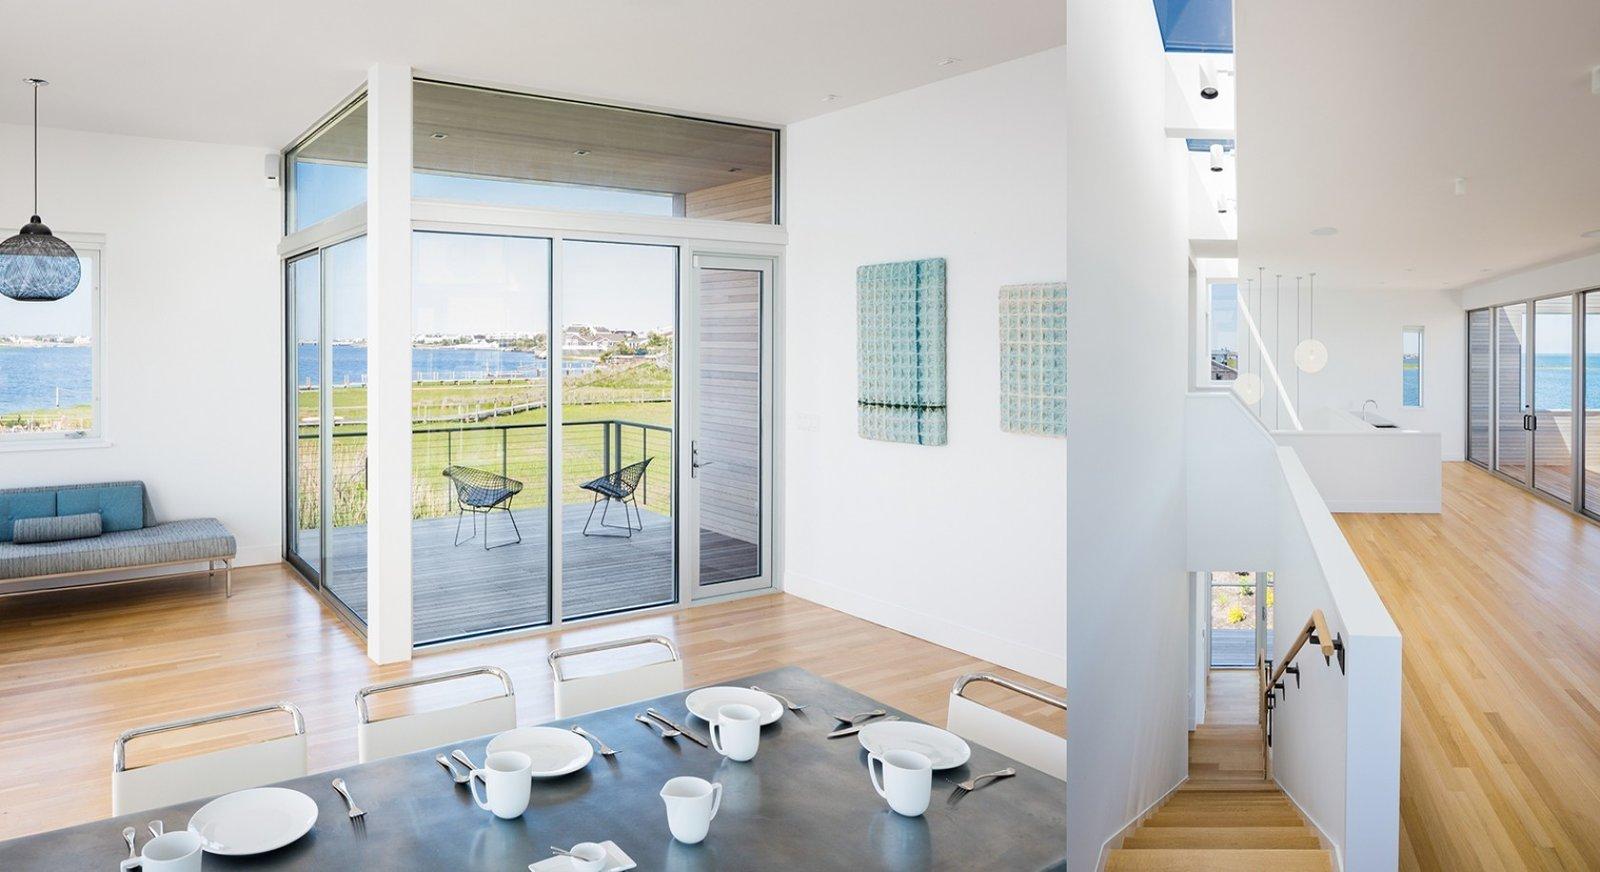 #CubeHouse #interior #inside #staircase #deck #chairs #seating #table #windows #naturallighting #dining #lighting #Westhamptonbeach #NewYork #LeroyStreetStudio   Cube House